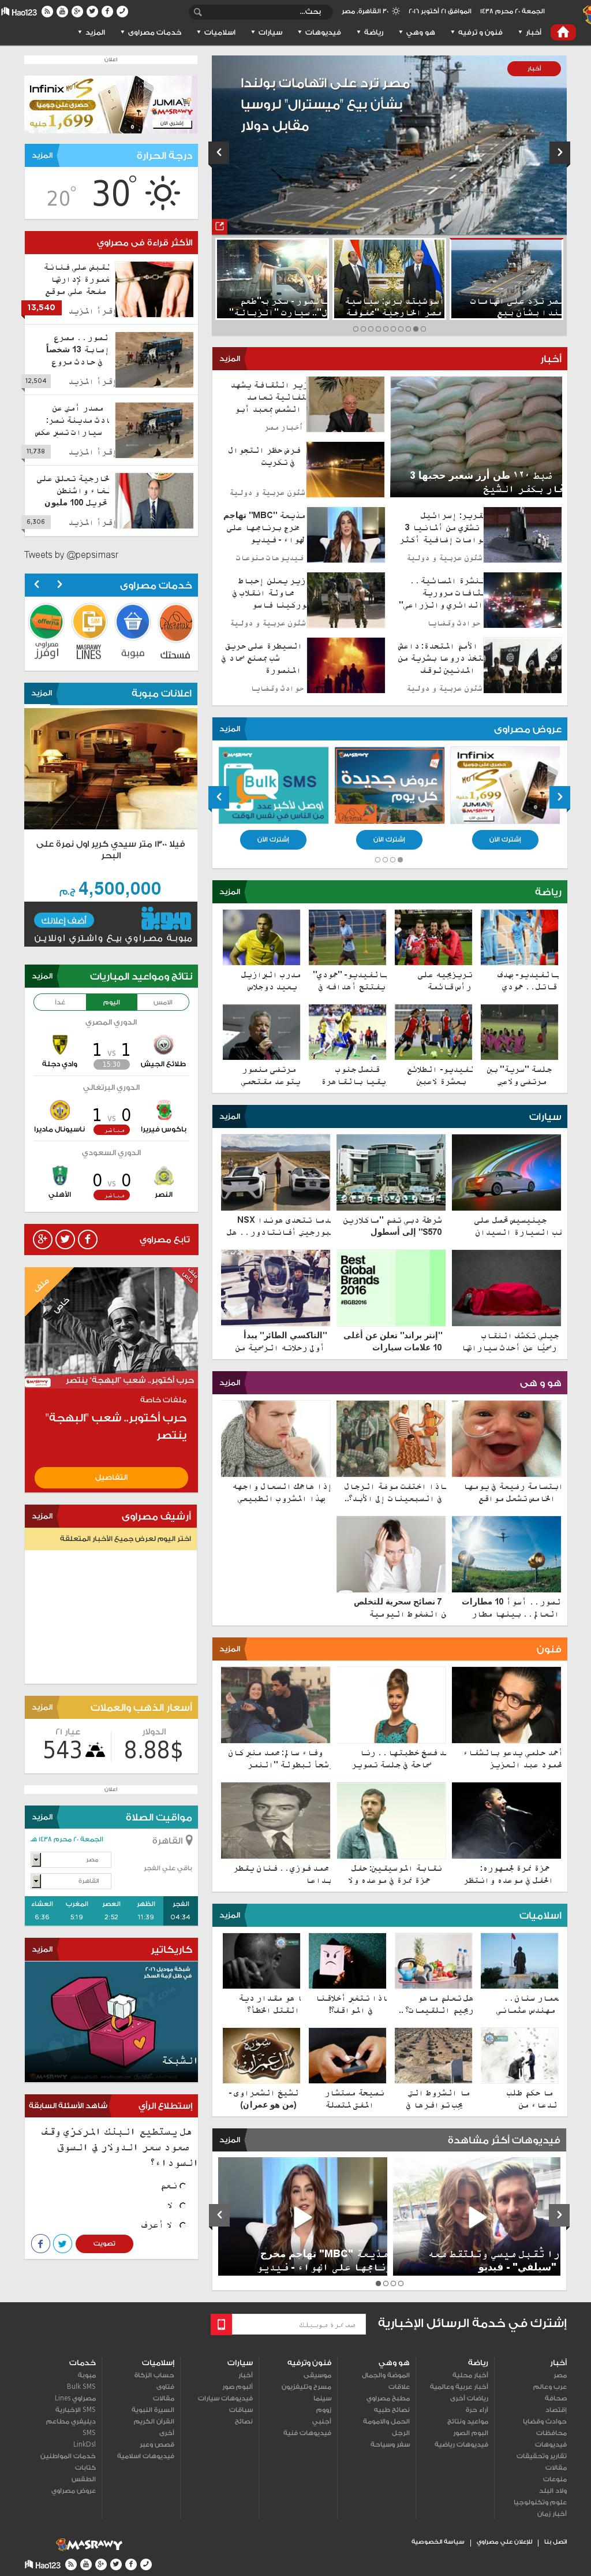 Masrawy at Friday Oct. 21, 2016, 7:10 p.m. UTC